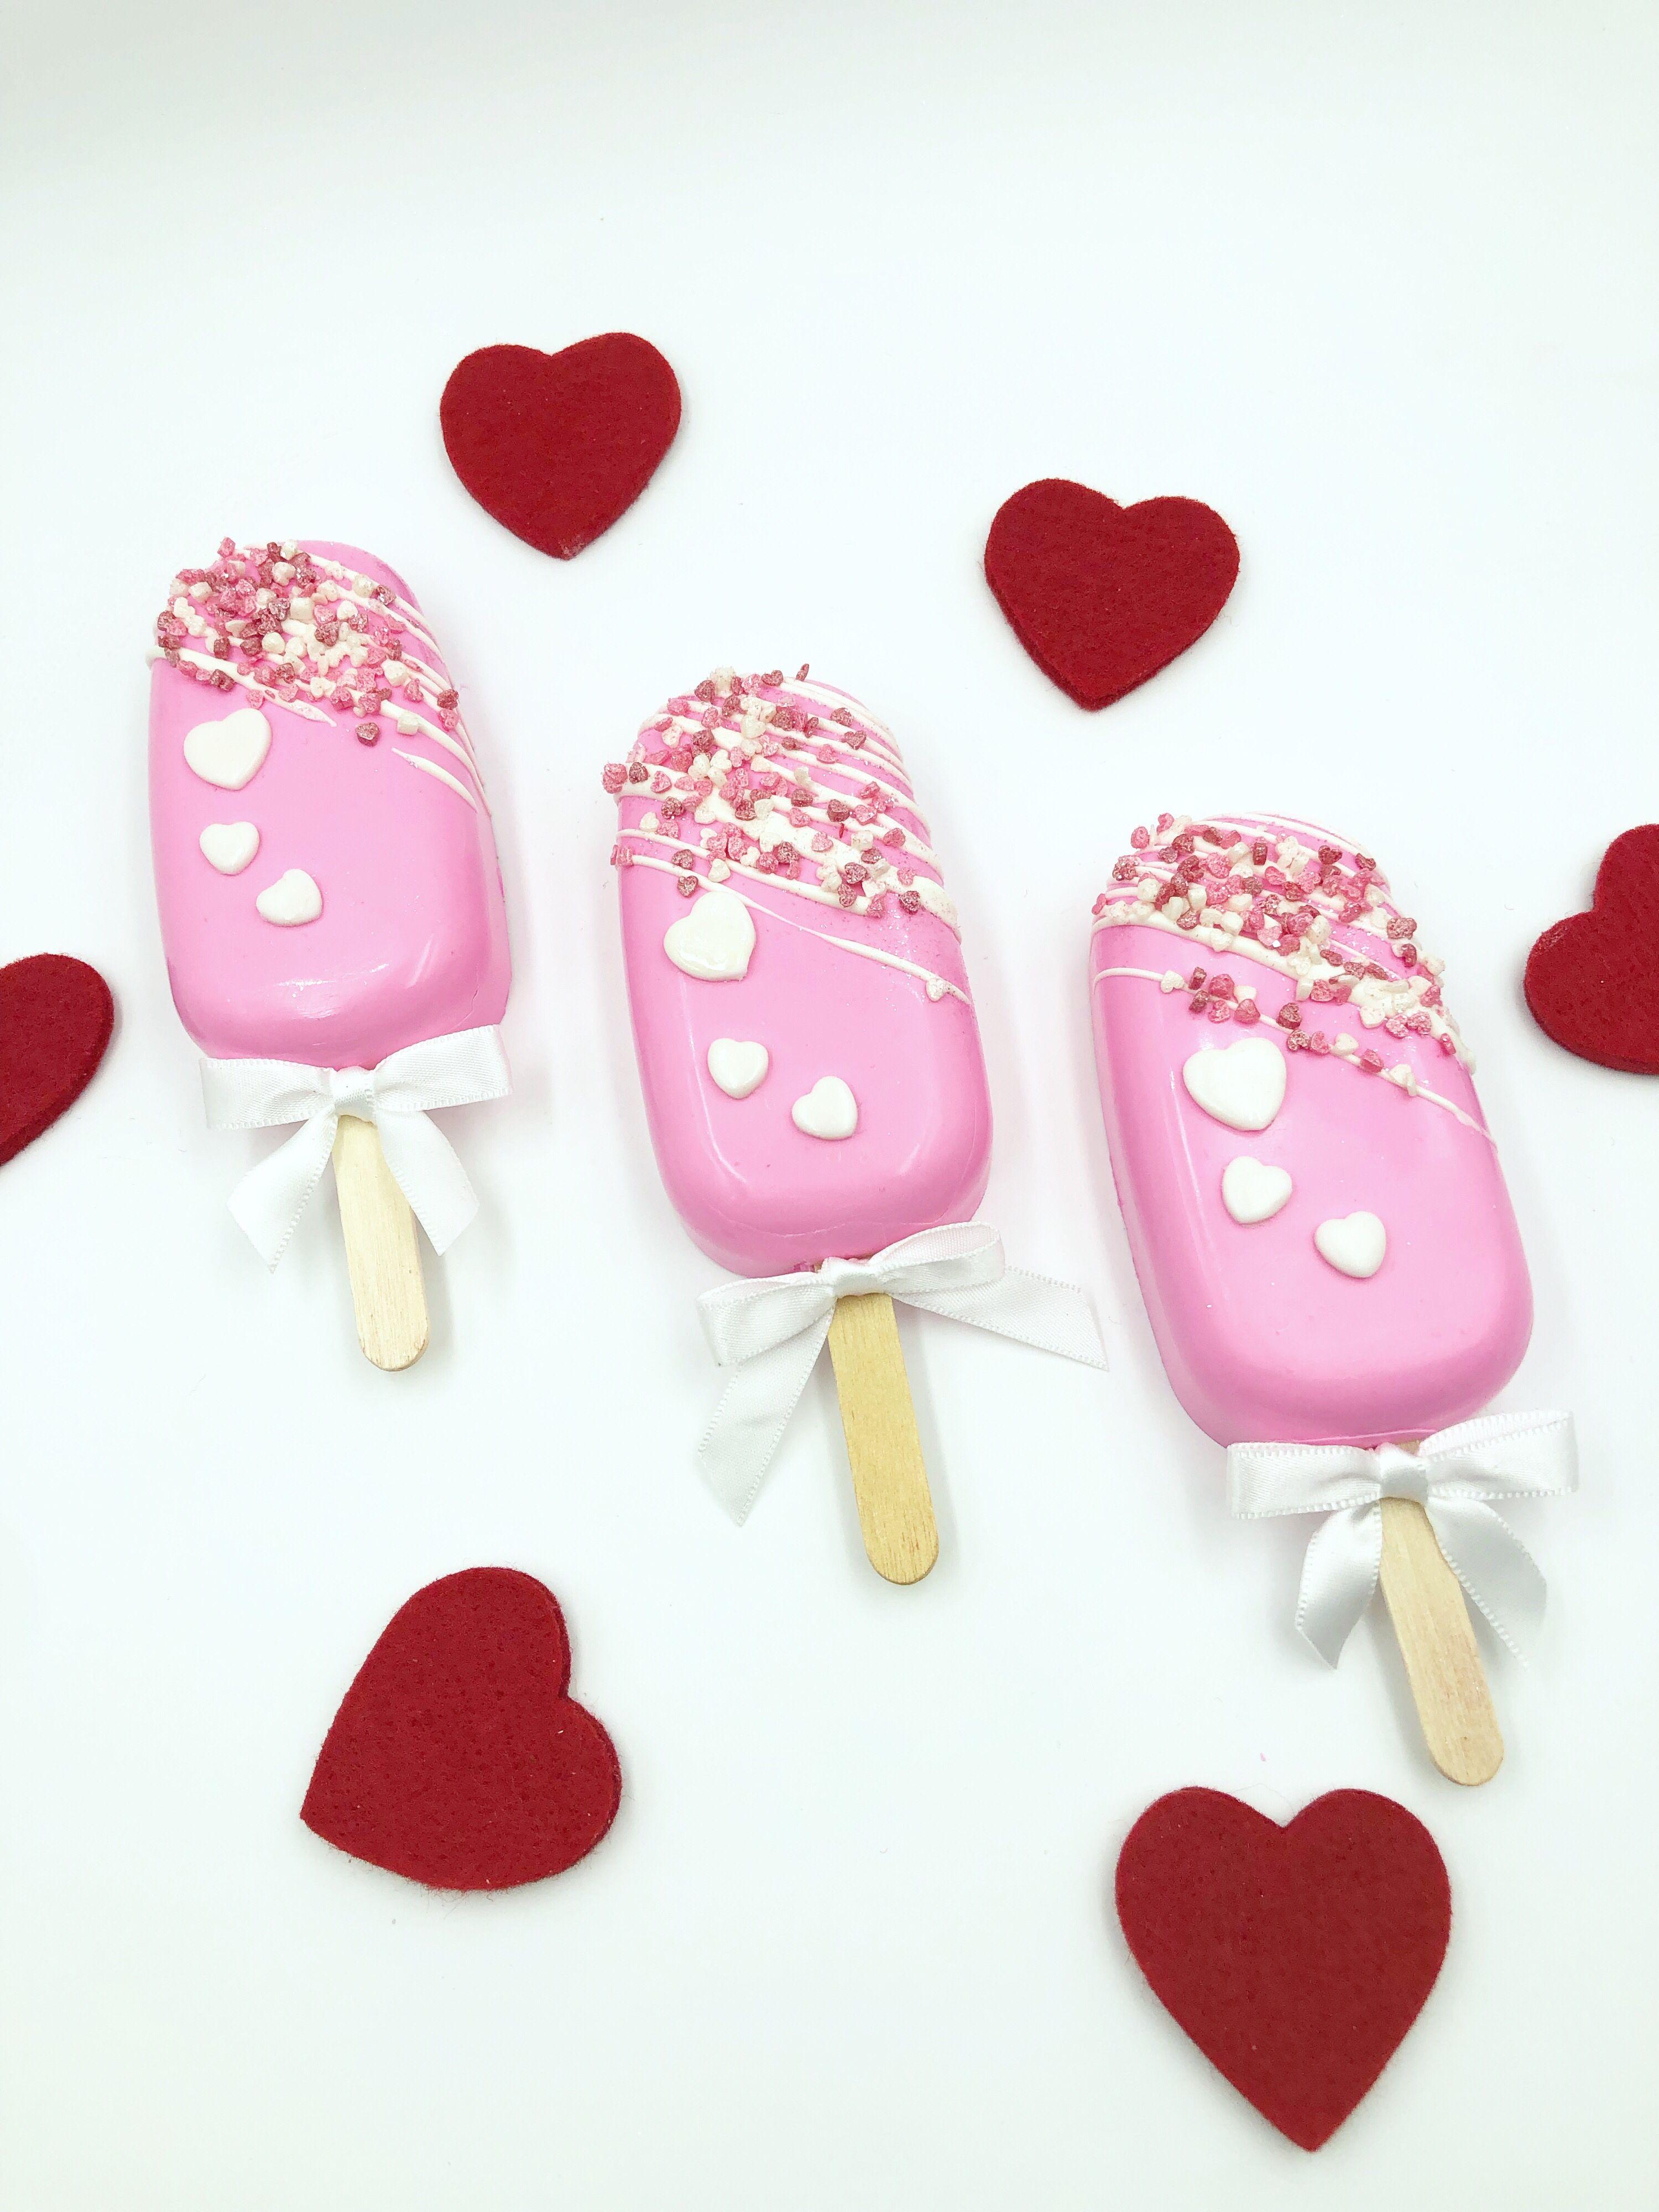 Strawberry cheesecake FilledCake Cakesicles | Ice cream cake pops, Valentine desserts, Chocolate covered treats